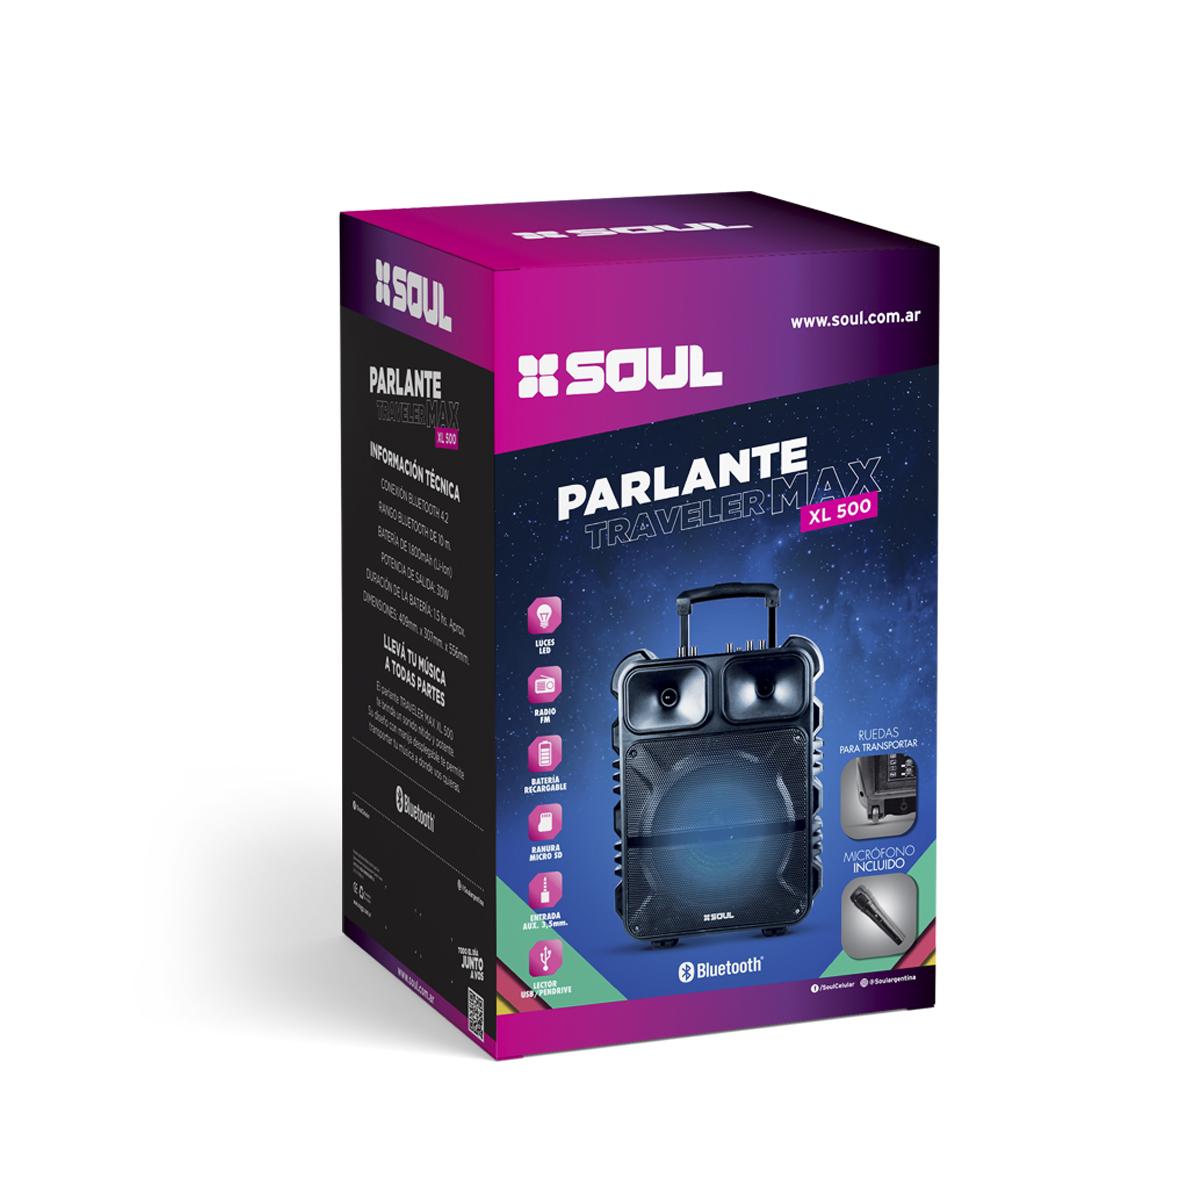 Parlante Traveler Max XL500